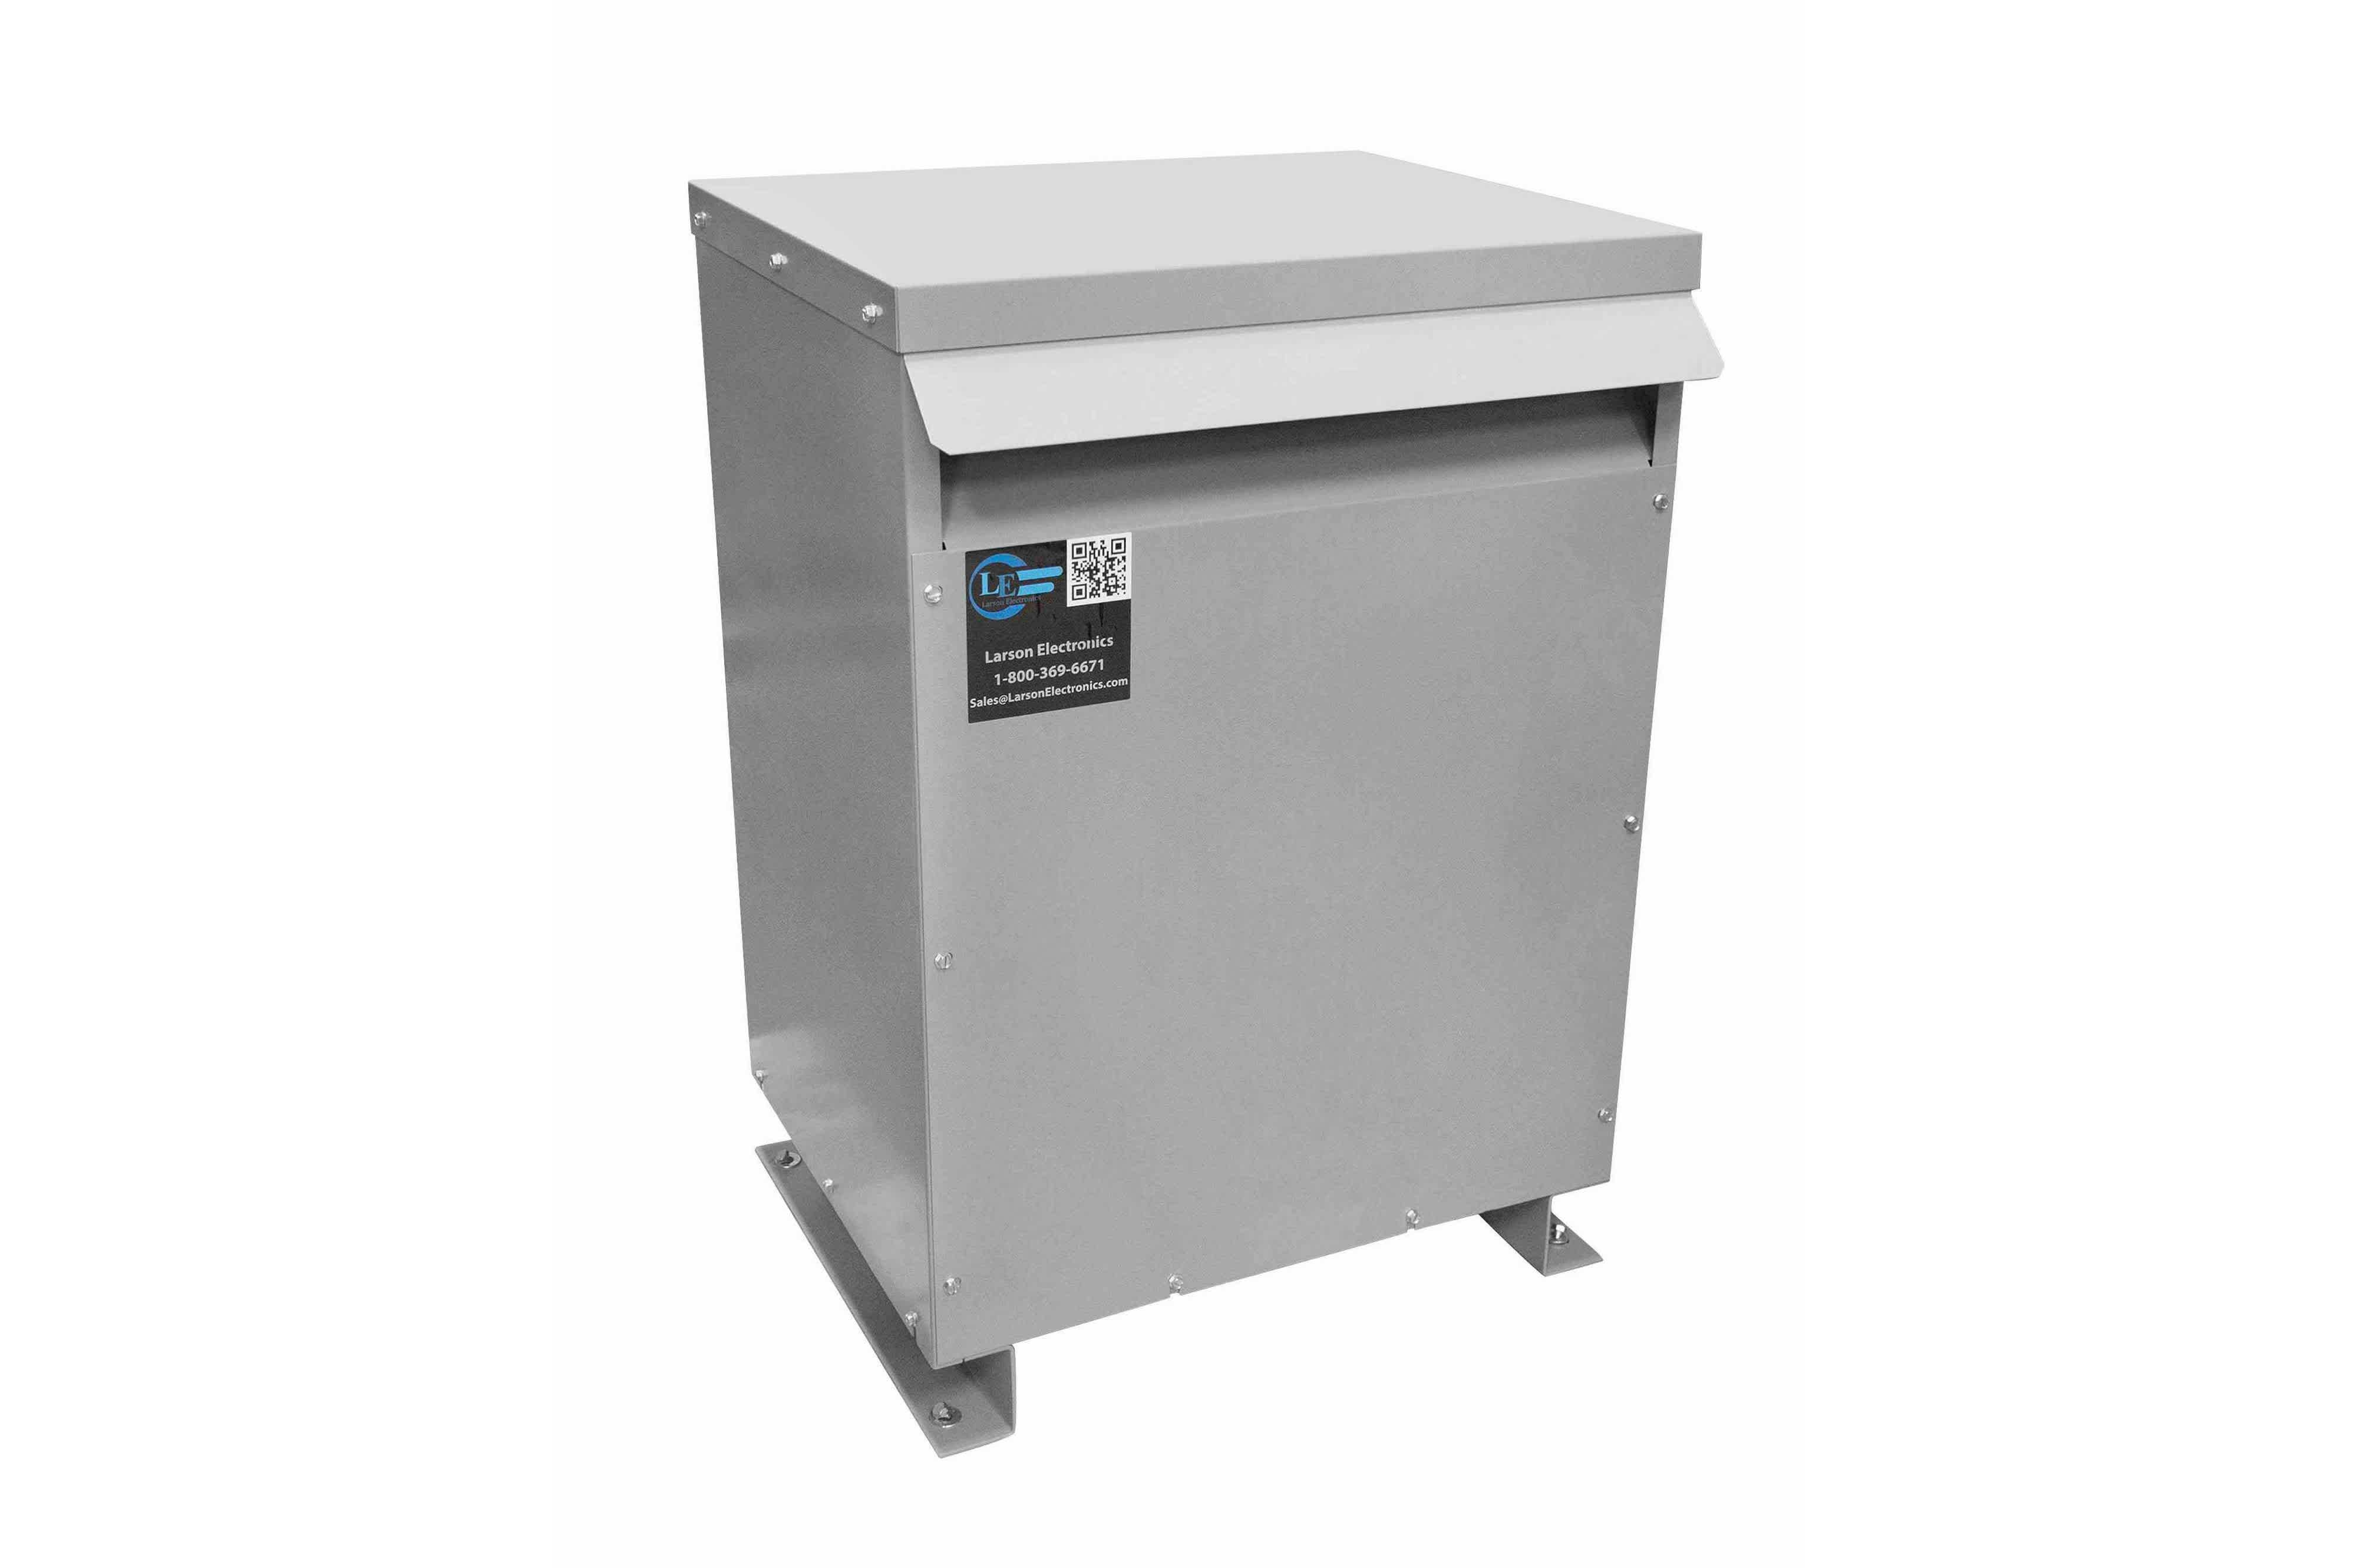 35 kVA 3PH Isolation Transformer, 460V Wye Primary, 380V Delta Secondary, N3R, Ventilated, 60 Hz